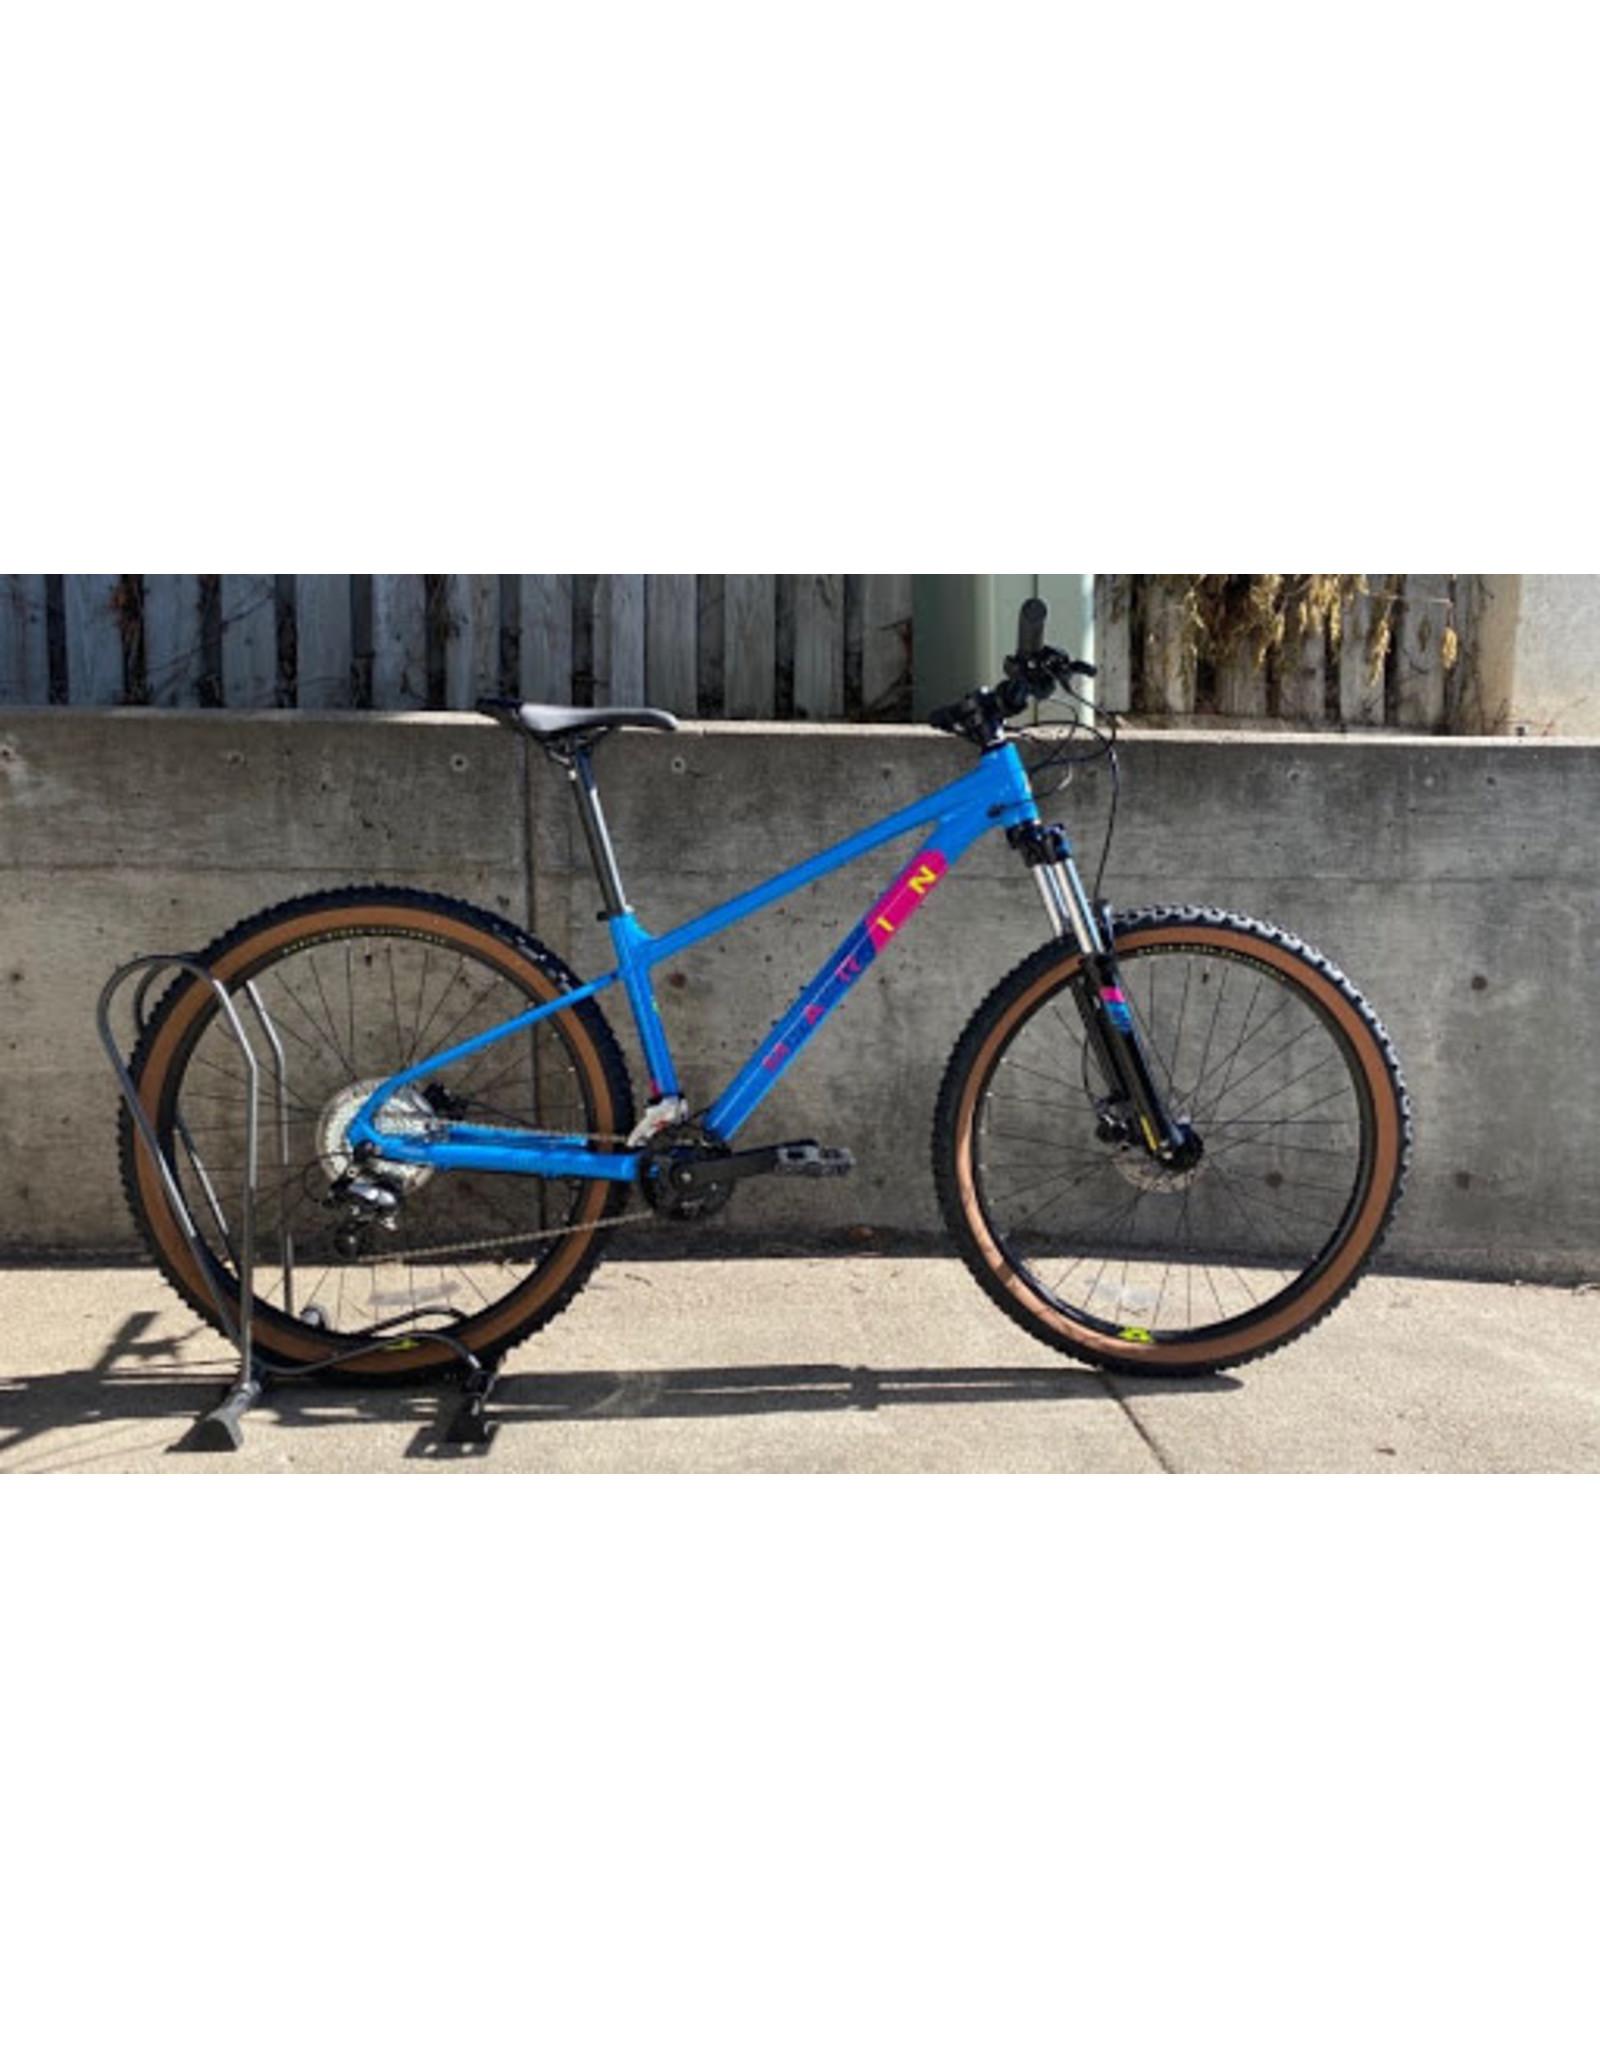 Marin Bikes 2022 Marin Bobcat Trail 3 GLOSS BRIGHT BLUE/DARK BLUE/YELLOW/MAGENTA